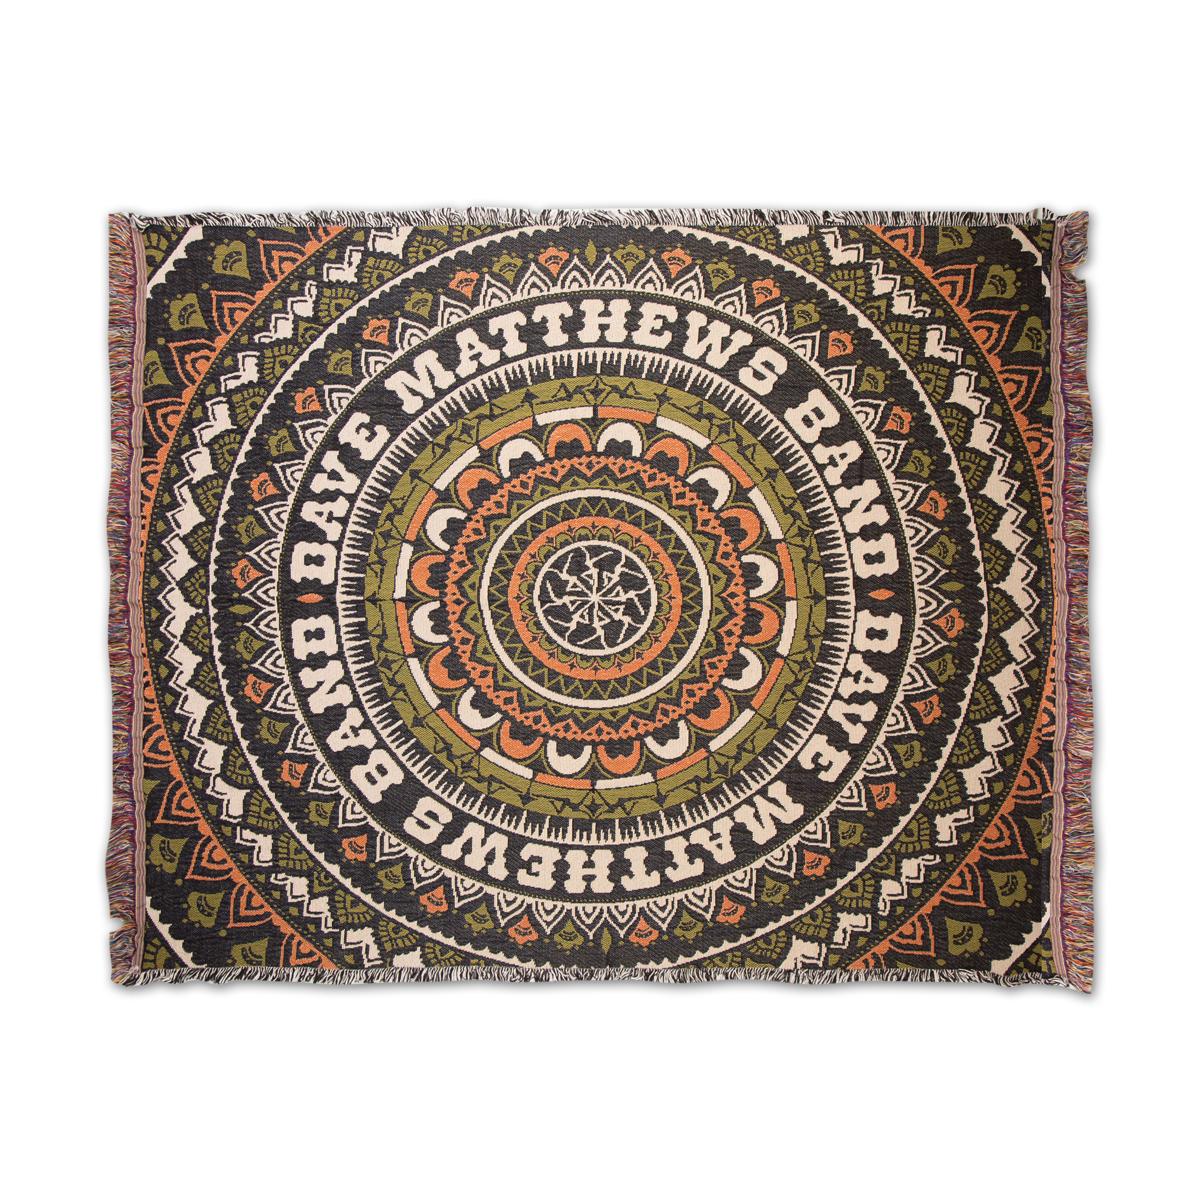 Firedancer Mandala Throw Blanket